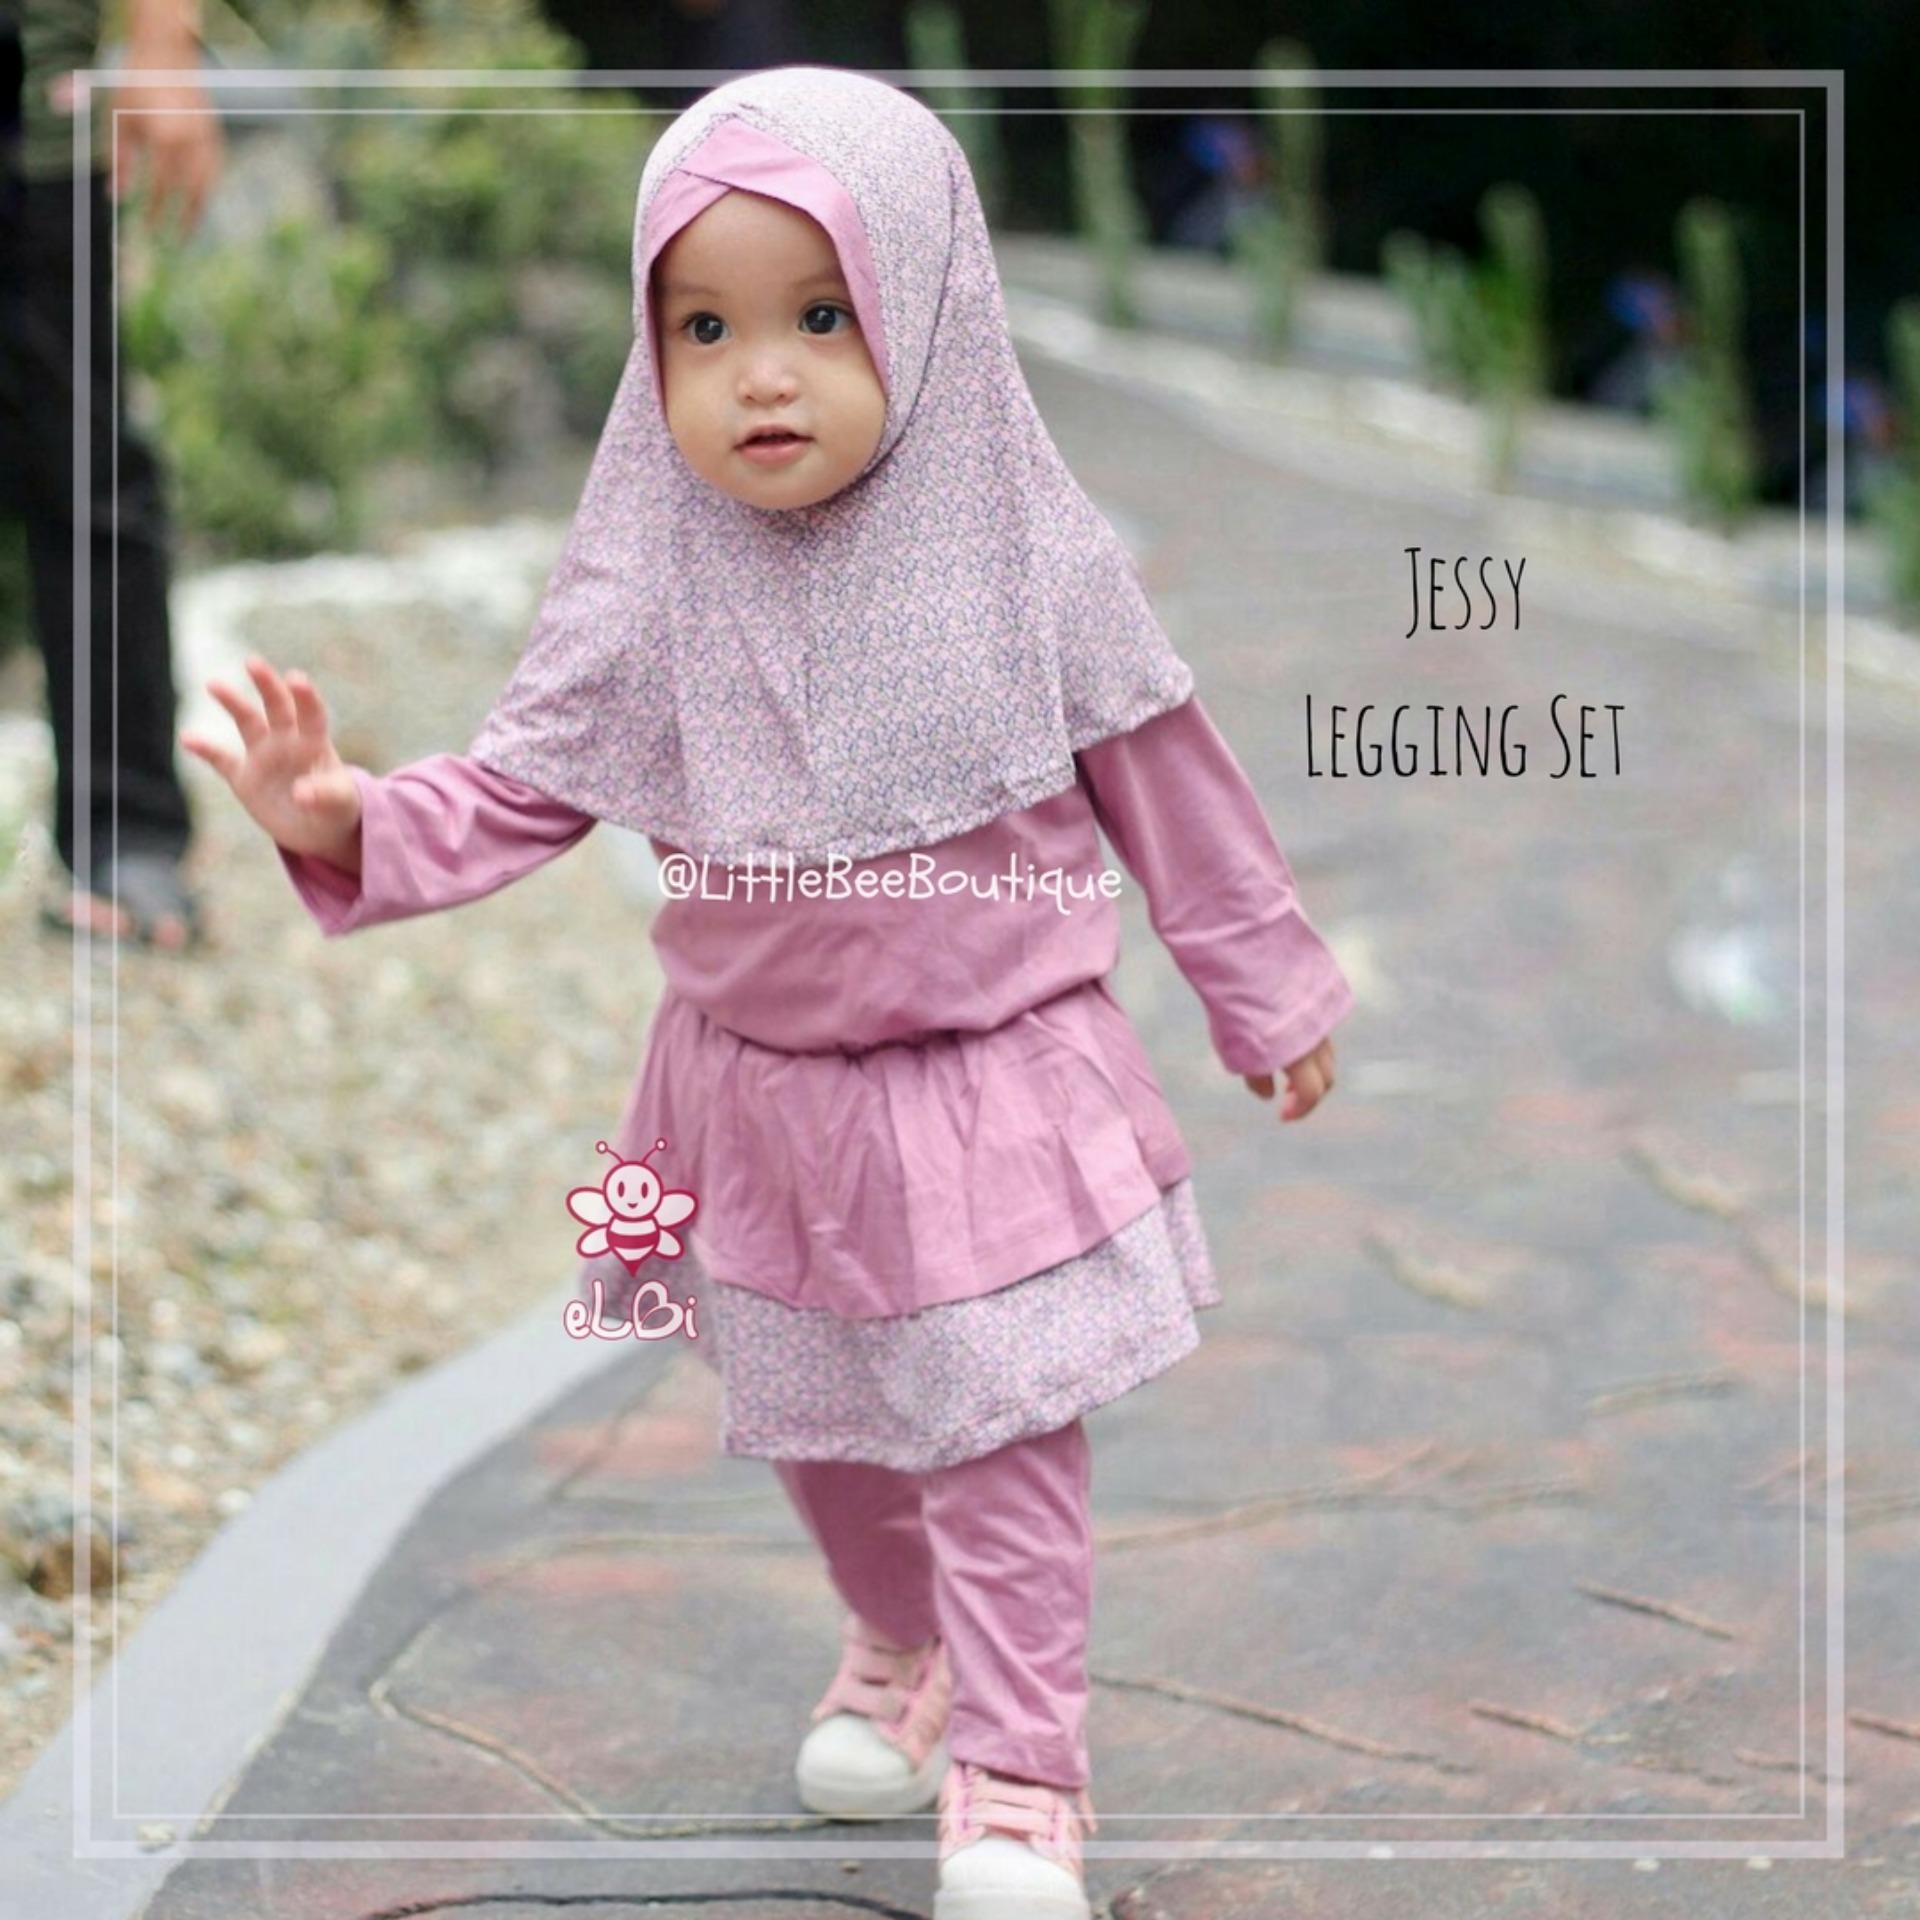 eLBi Jessy Legging Set Little Bee Boutique / Baju Muslim Anak Perempuan / Baju Bayi / Baju Anak / Baju Balita